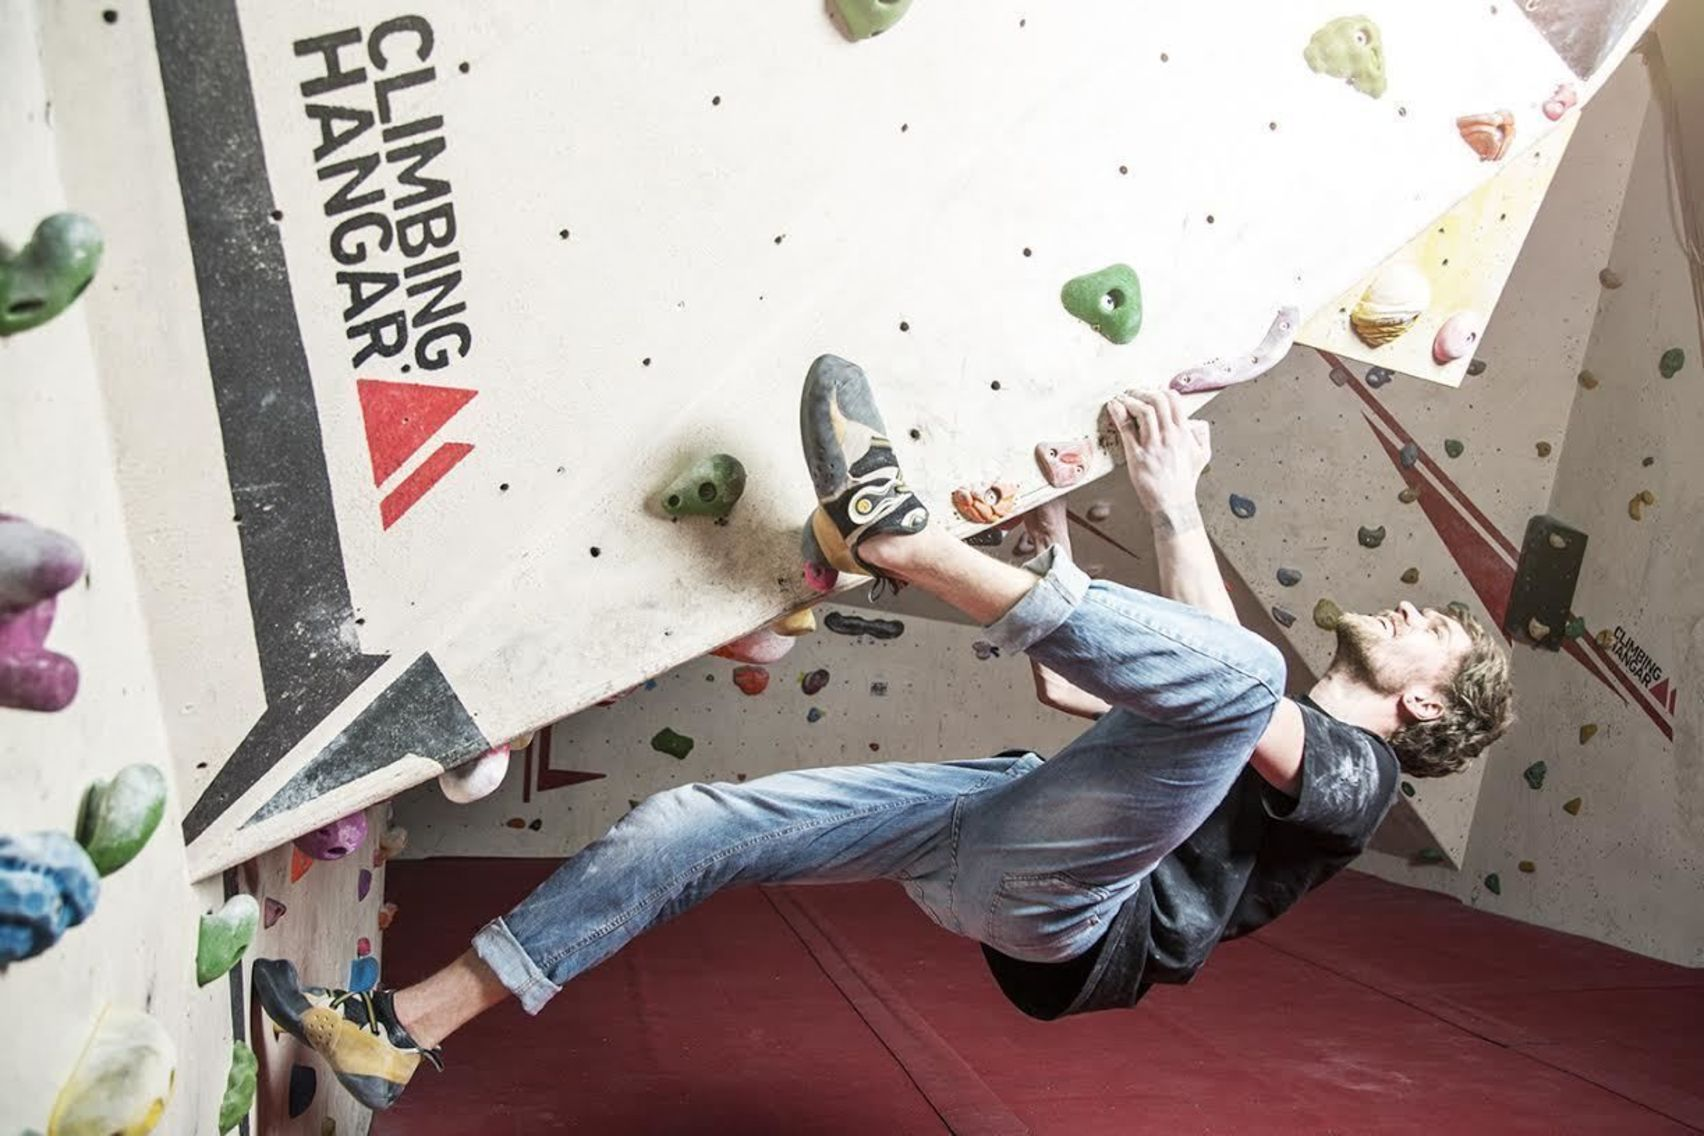 A man on a climbing wall.